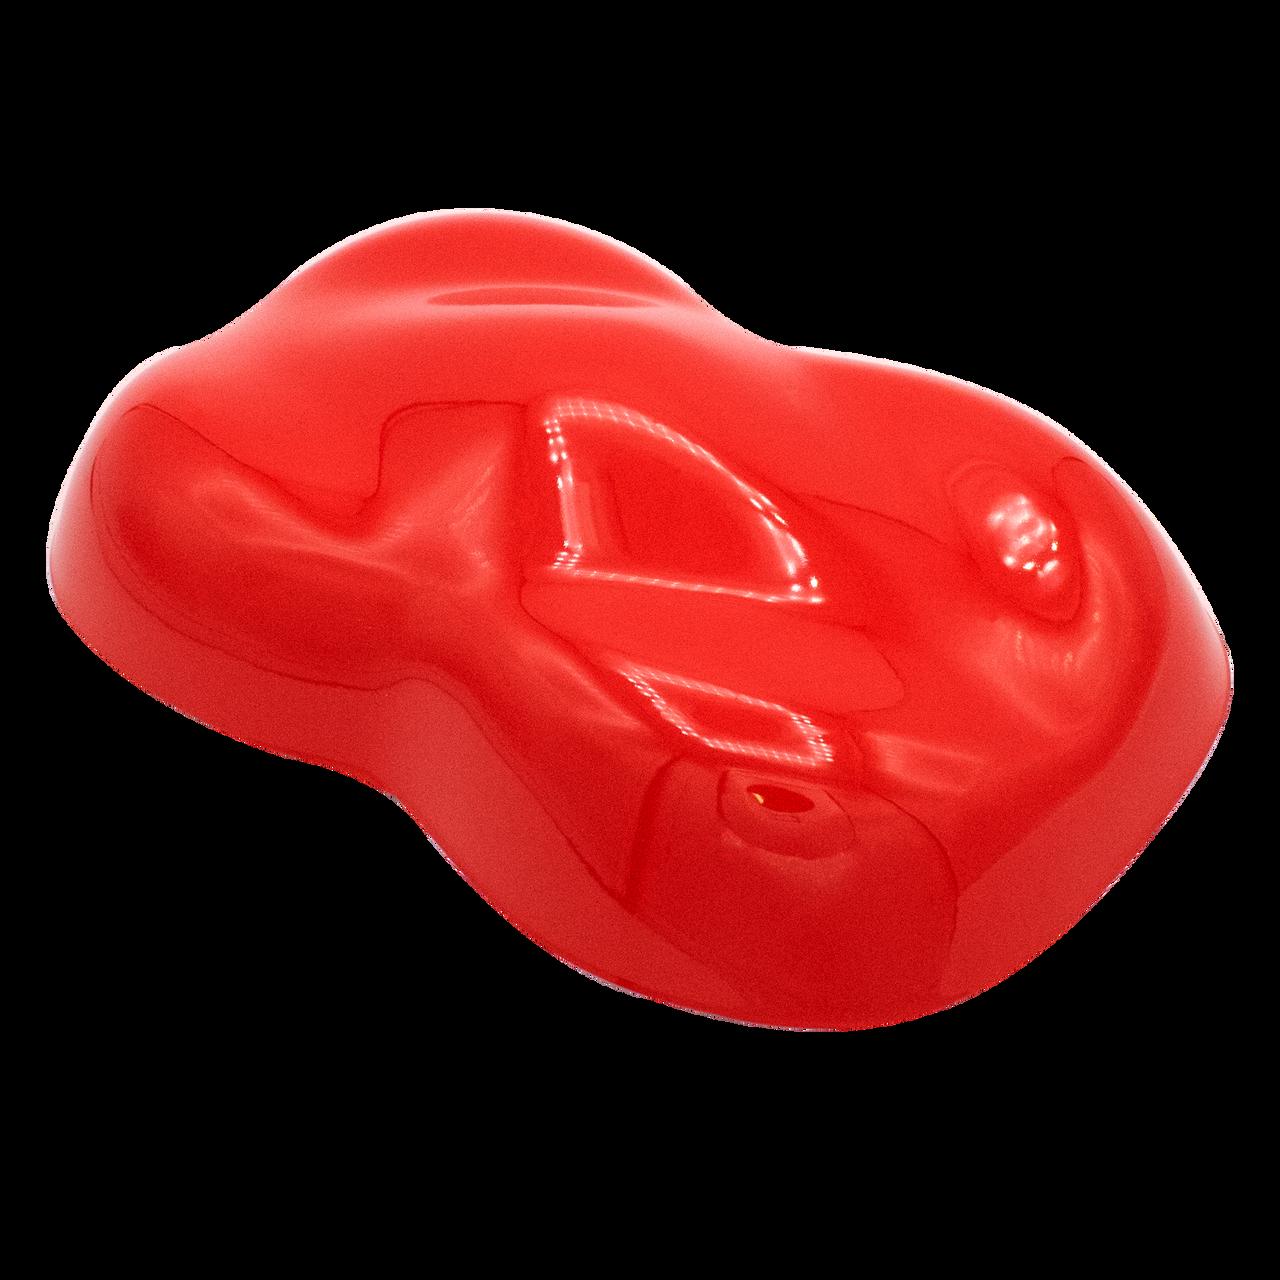 High Gloss Race Red 2K Acrylic Urethane, 4:1 Gallon Mid Temp Kit, SPK9714/SPK75 2.8 VOC Race Red Single Stage Paint, Use in 70 - 80 F